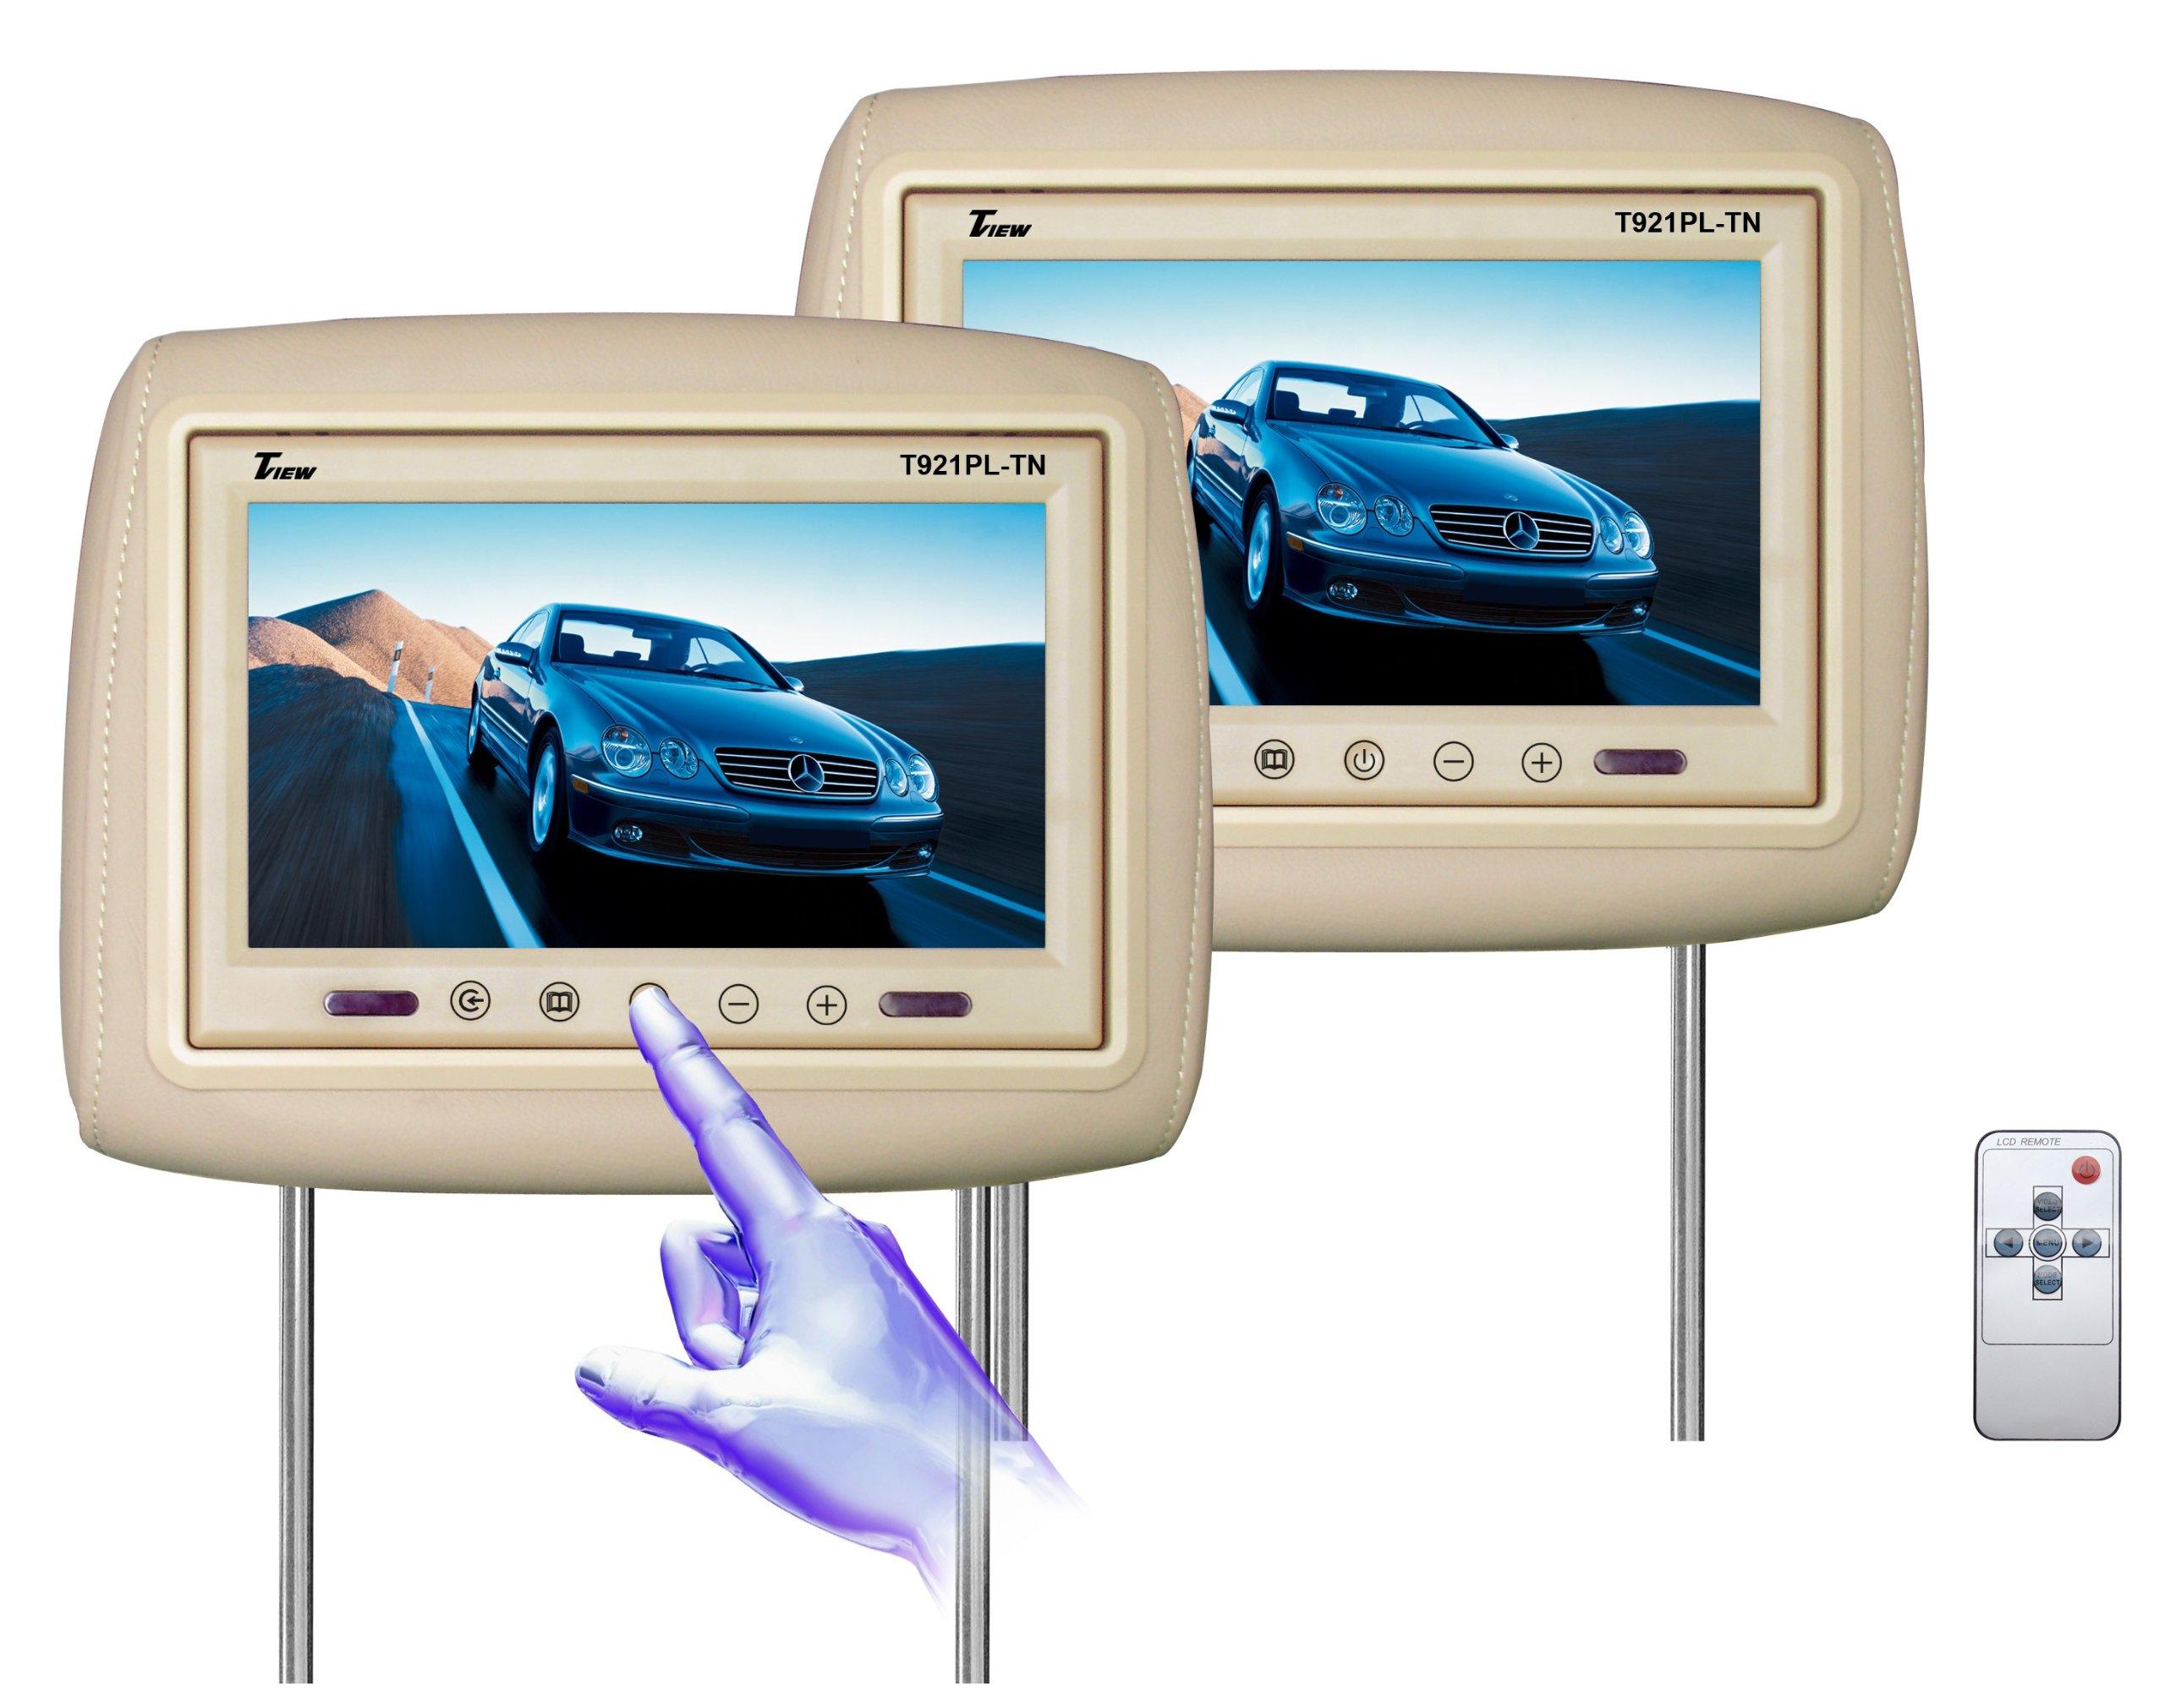 Tview T921PL-TN 9-Inch Car Headrest Monitor (Beige)